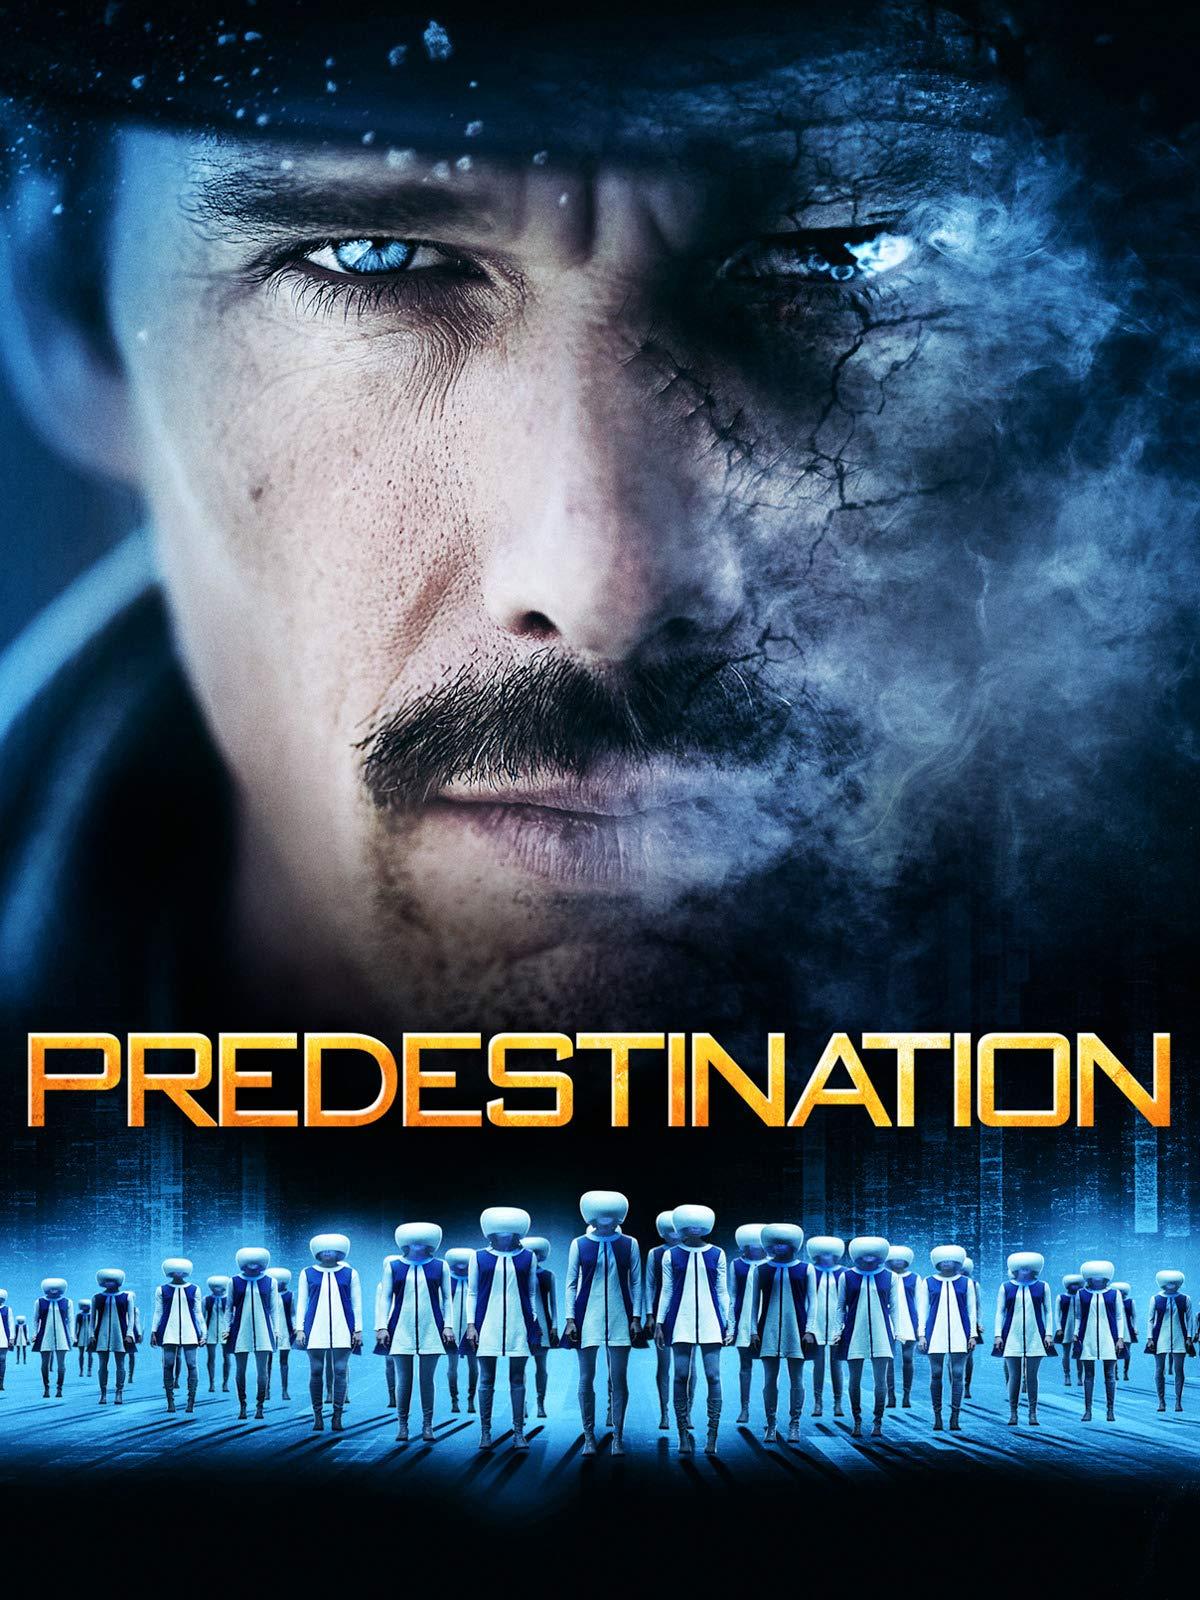 Predestination